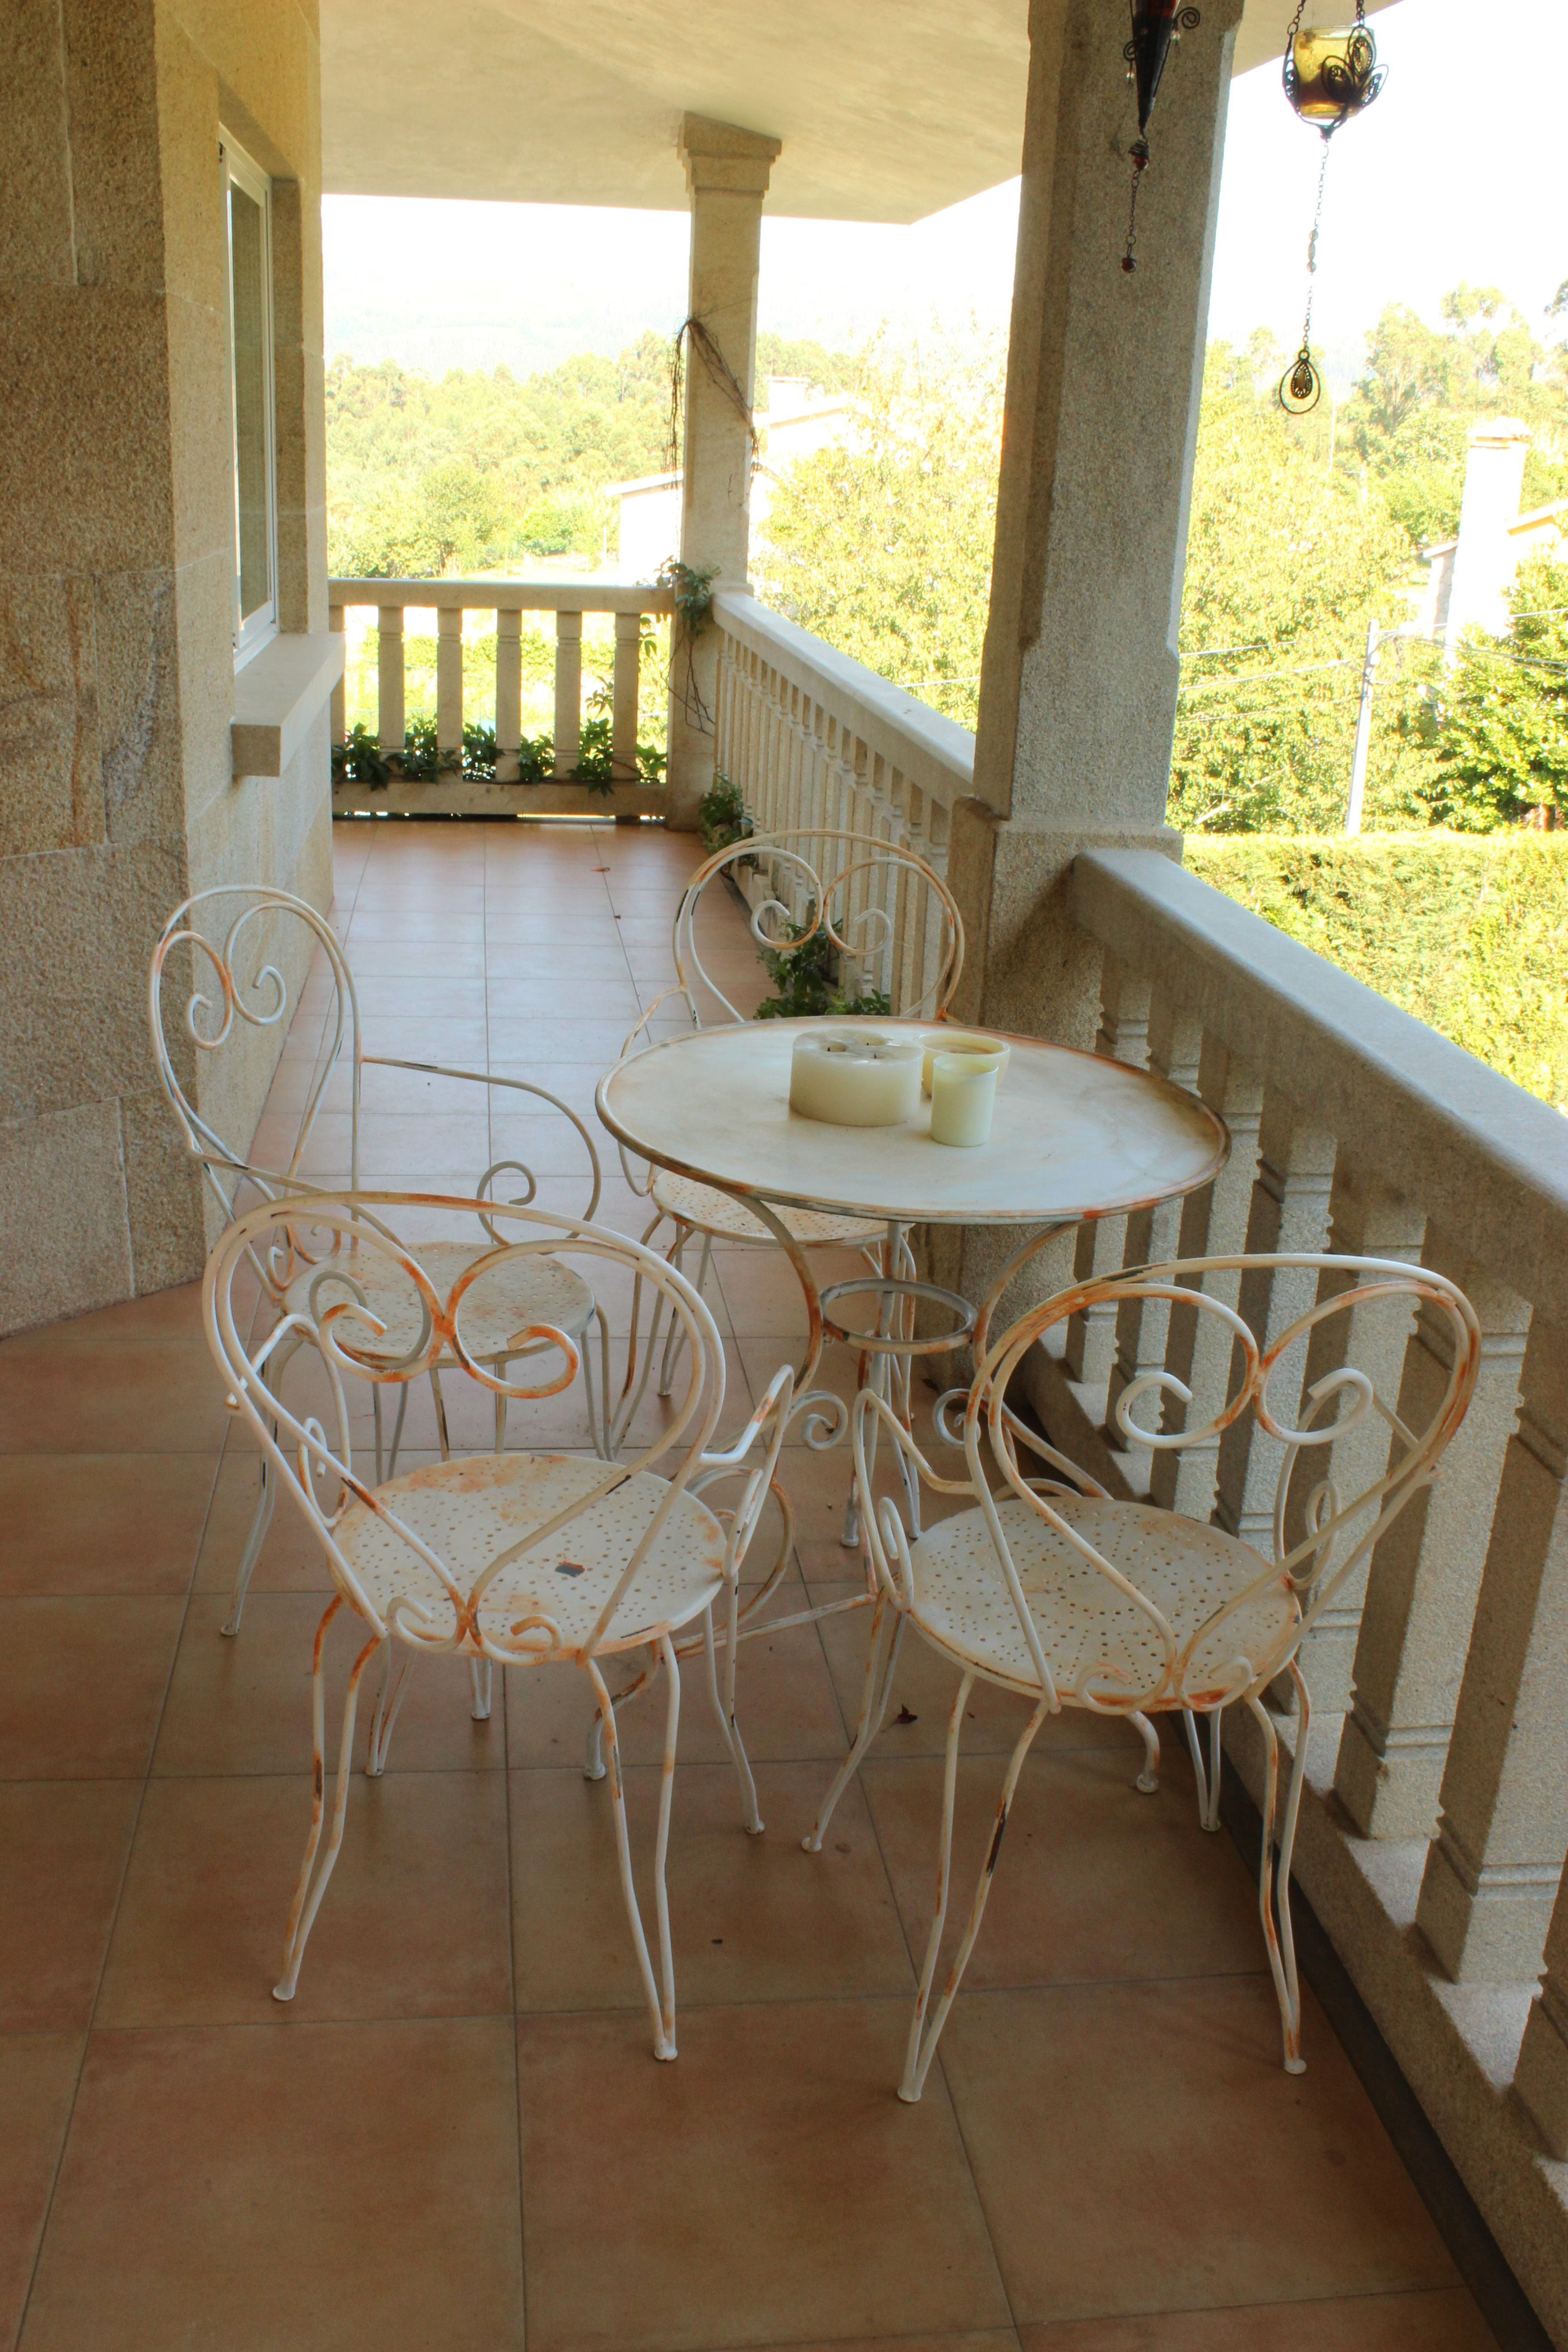 Muebles Jardin Forja Dise Os Arquitect Nicos Mimasku Com # Jayso Muebles De Forja